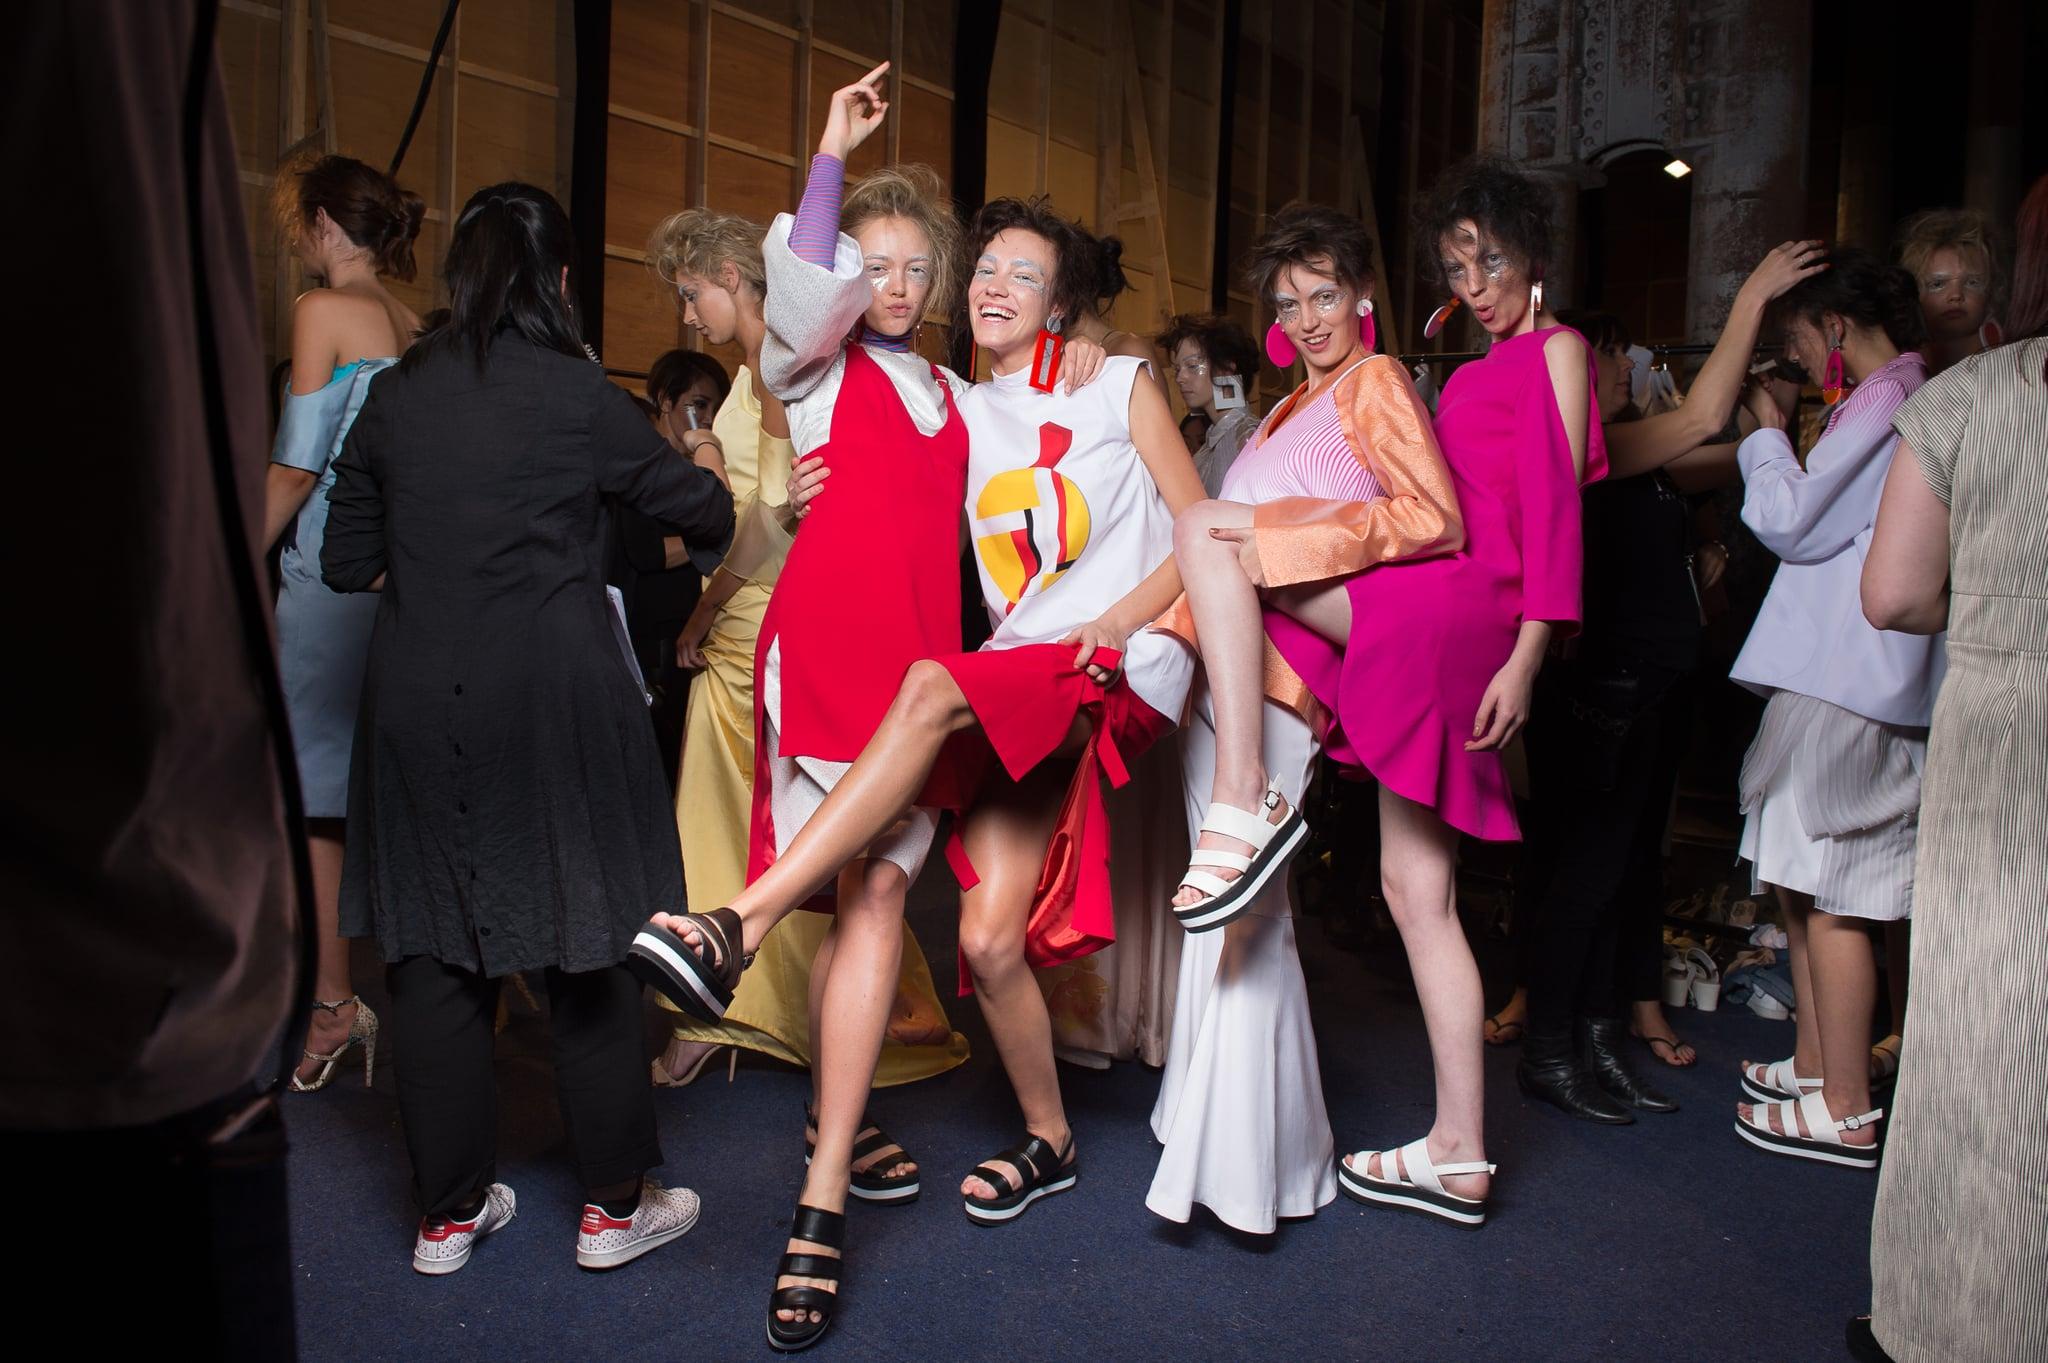 Popsugar Australia When Did You First Fall In Love With Fashion Leah Williams Designer Interview Popsugar Fashion Australia Photo 2